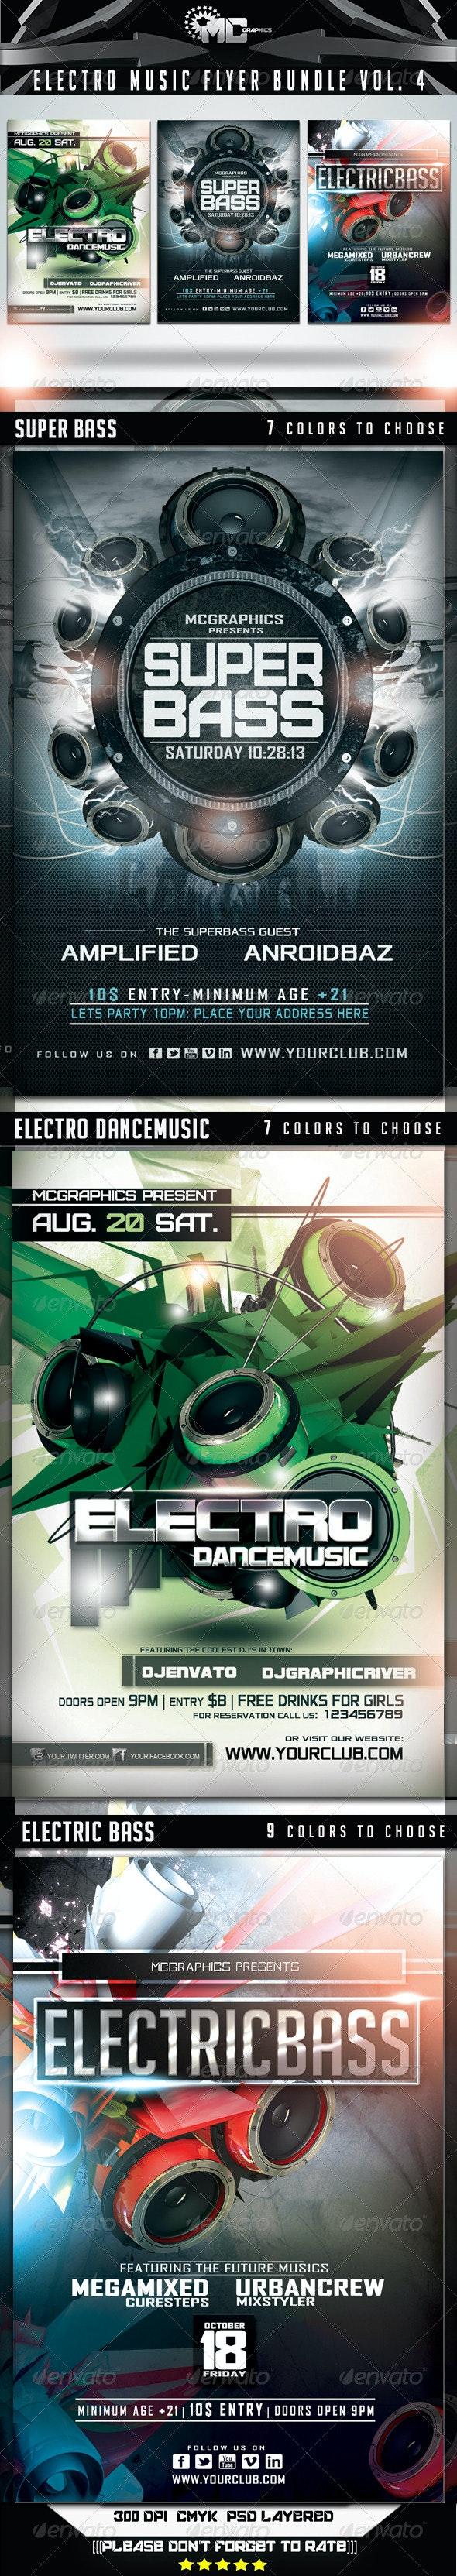 Electro Music Flyer Bundle Vol. 4 - Events Flyers